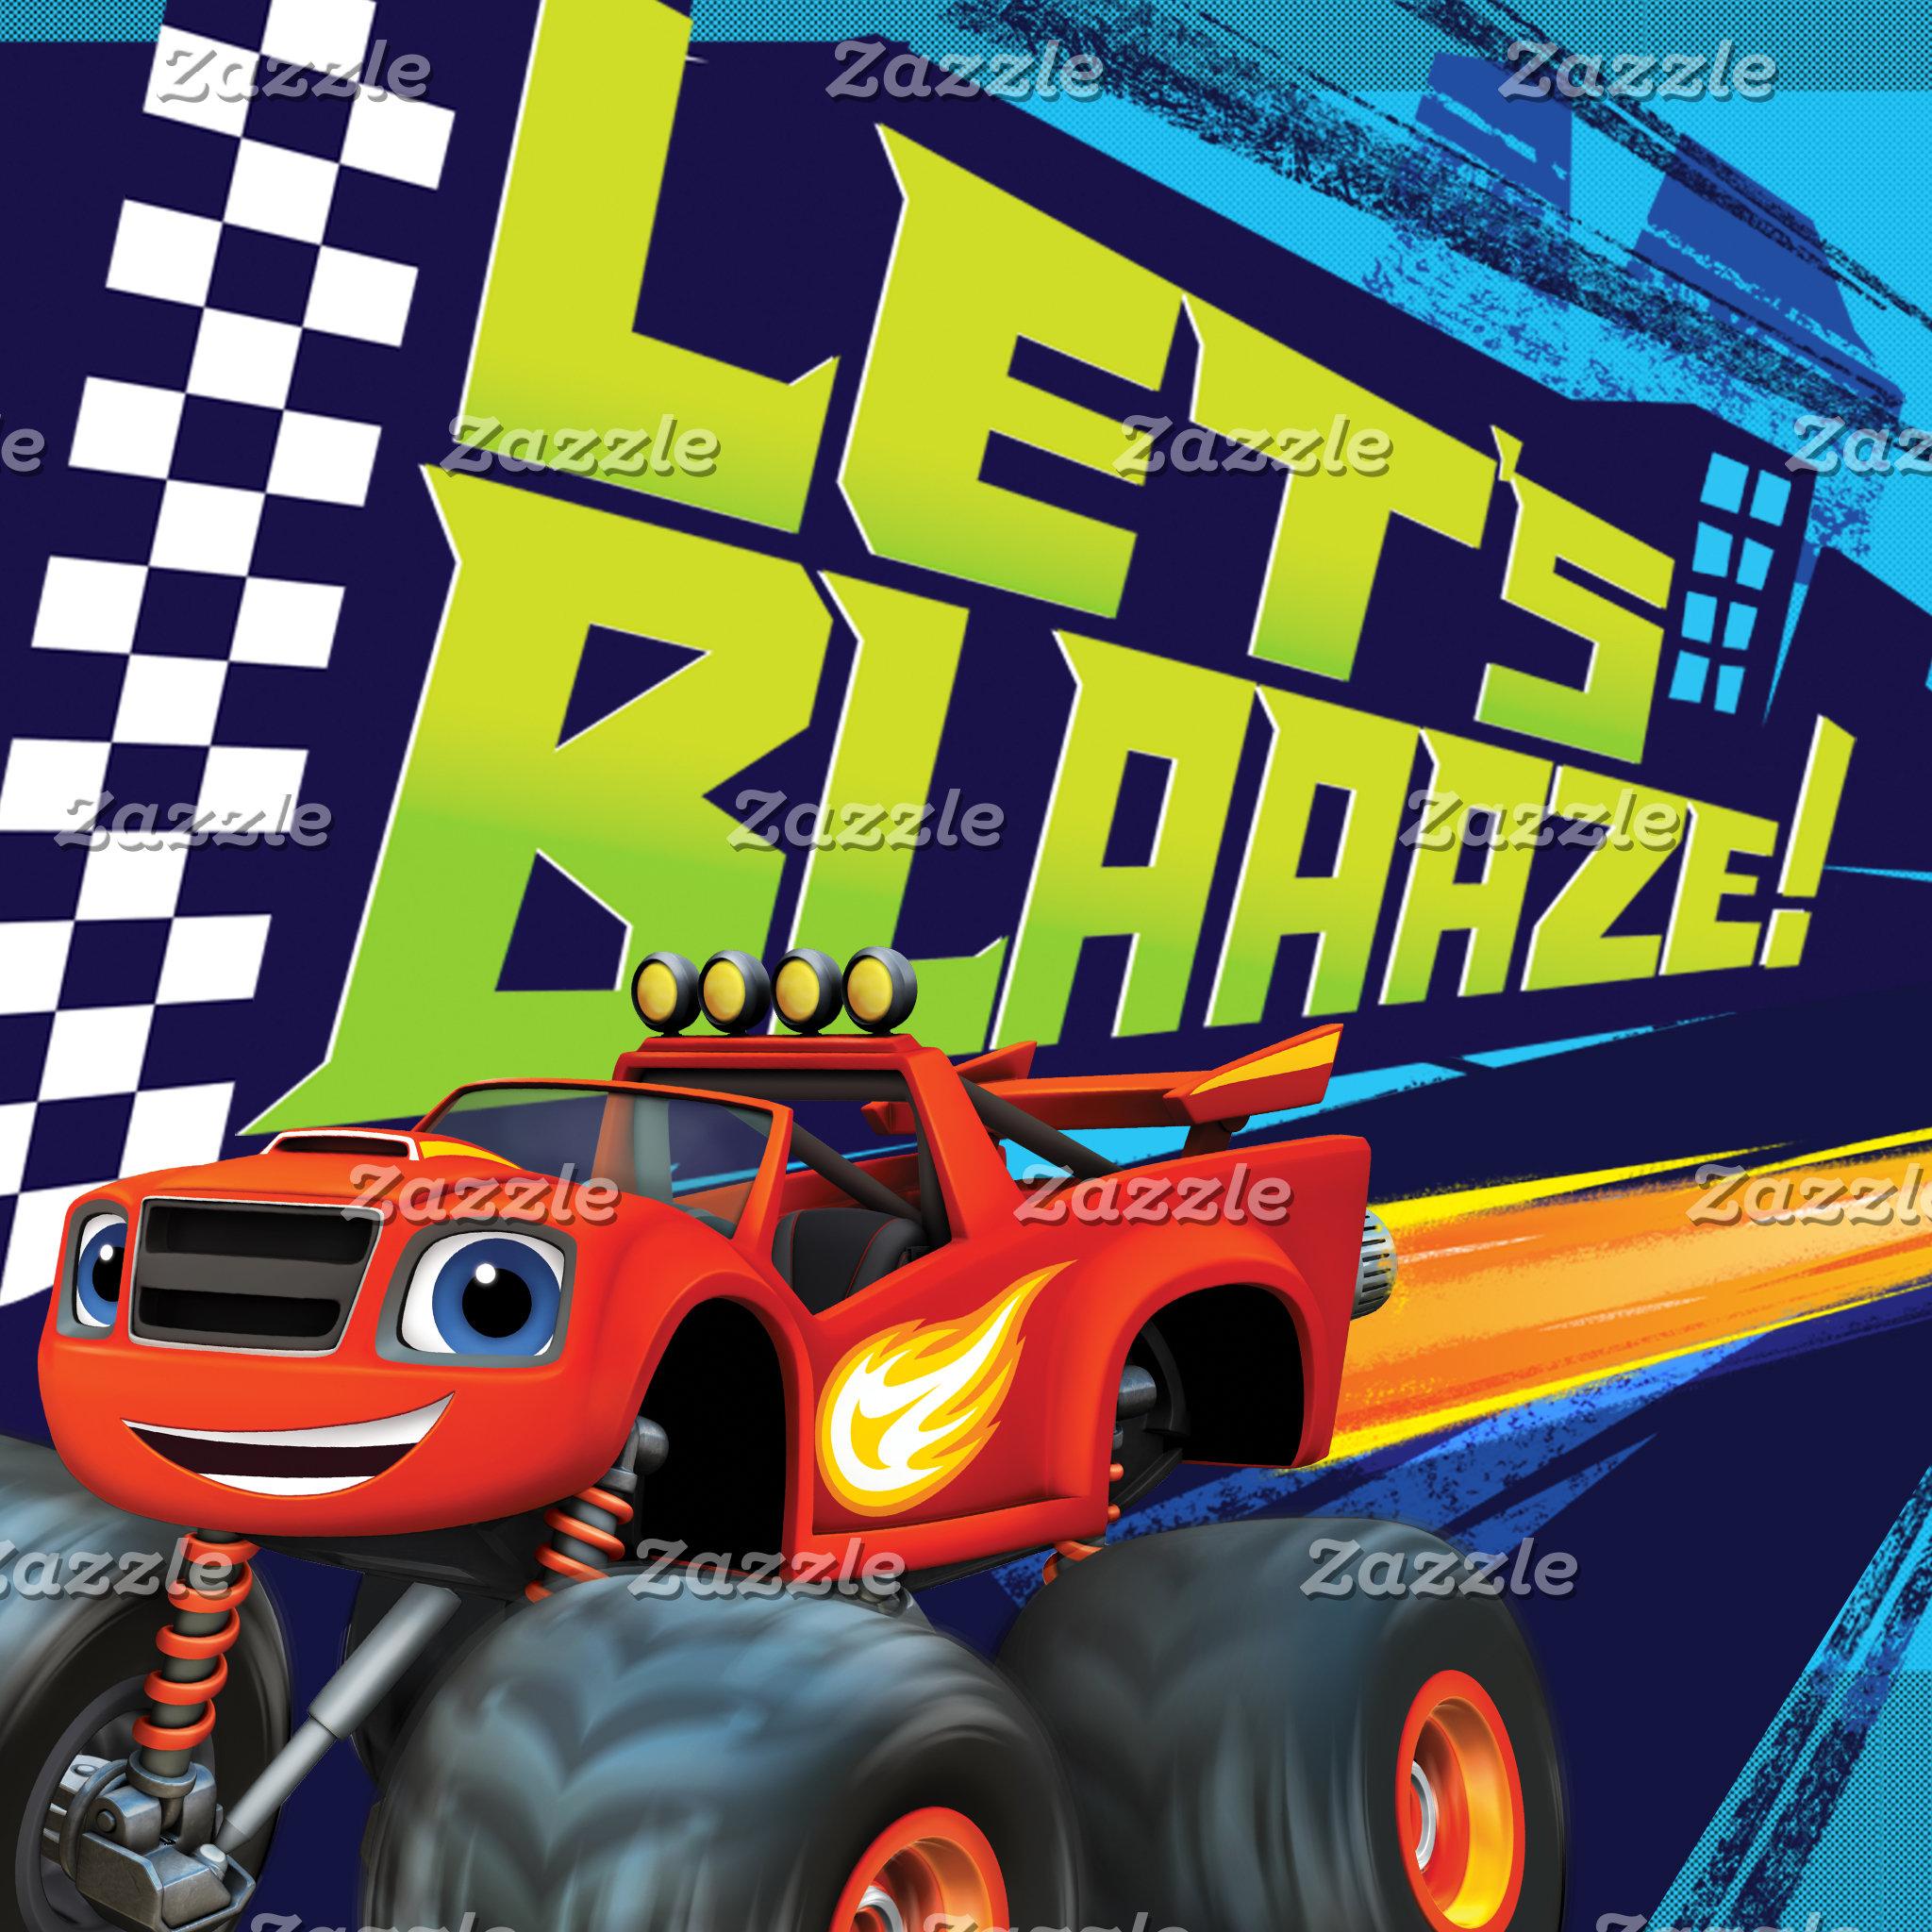 Let's Blaaaze!